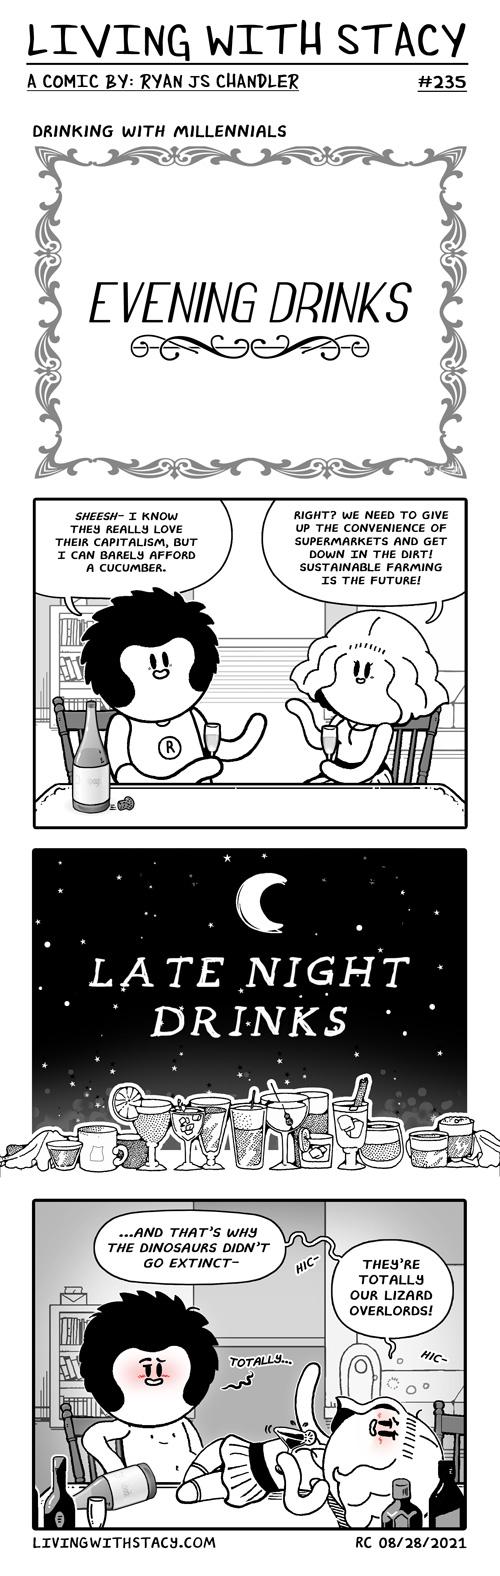 Life With Cats - Sleeping - LWS COMICS #237